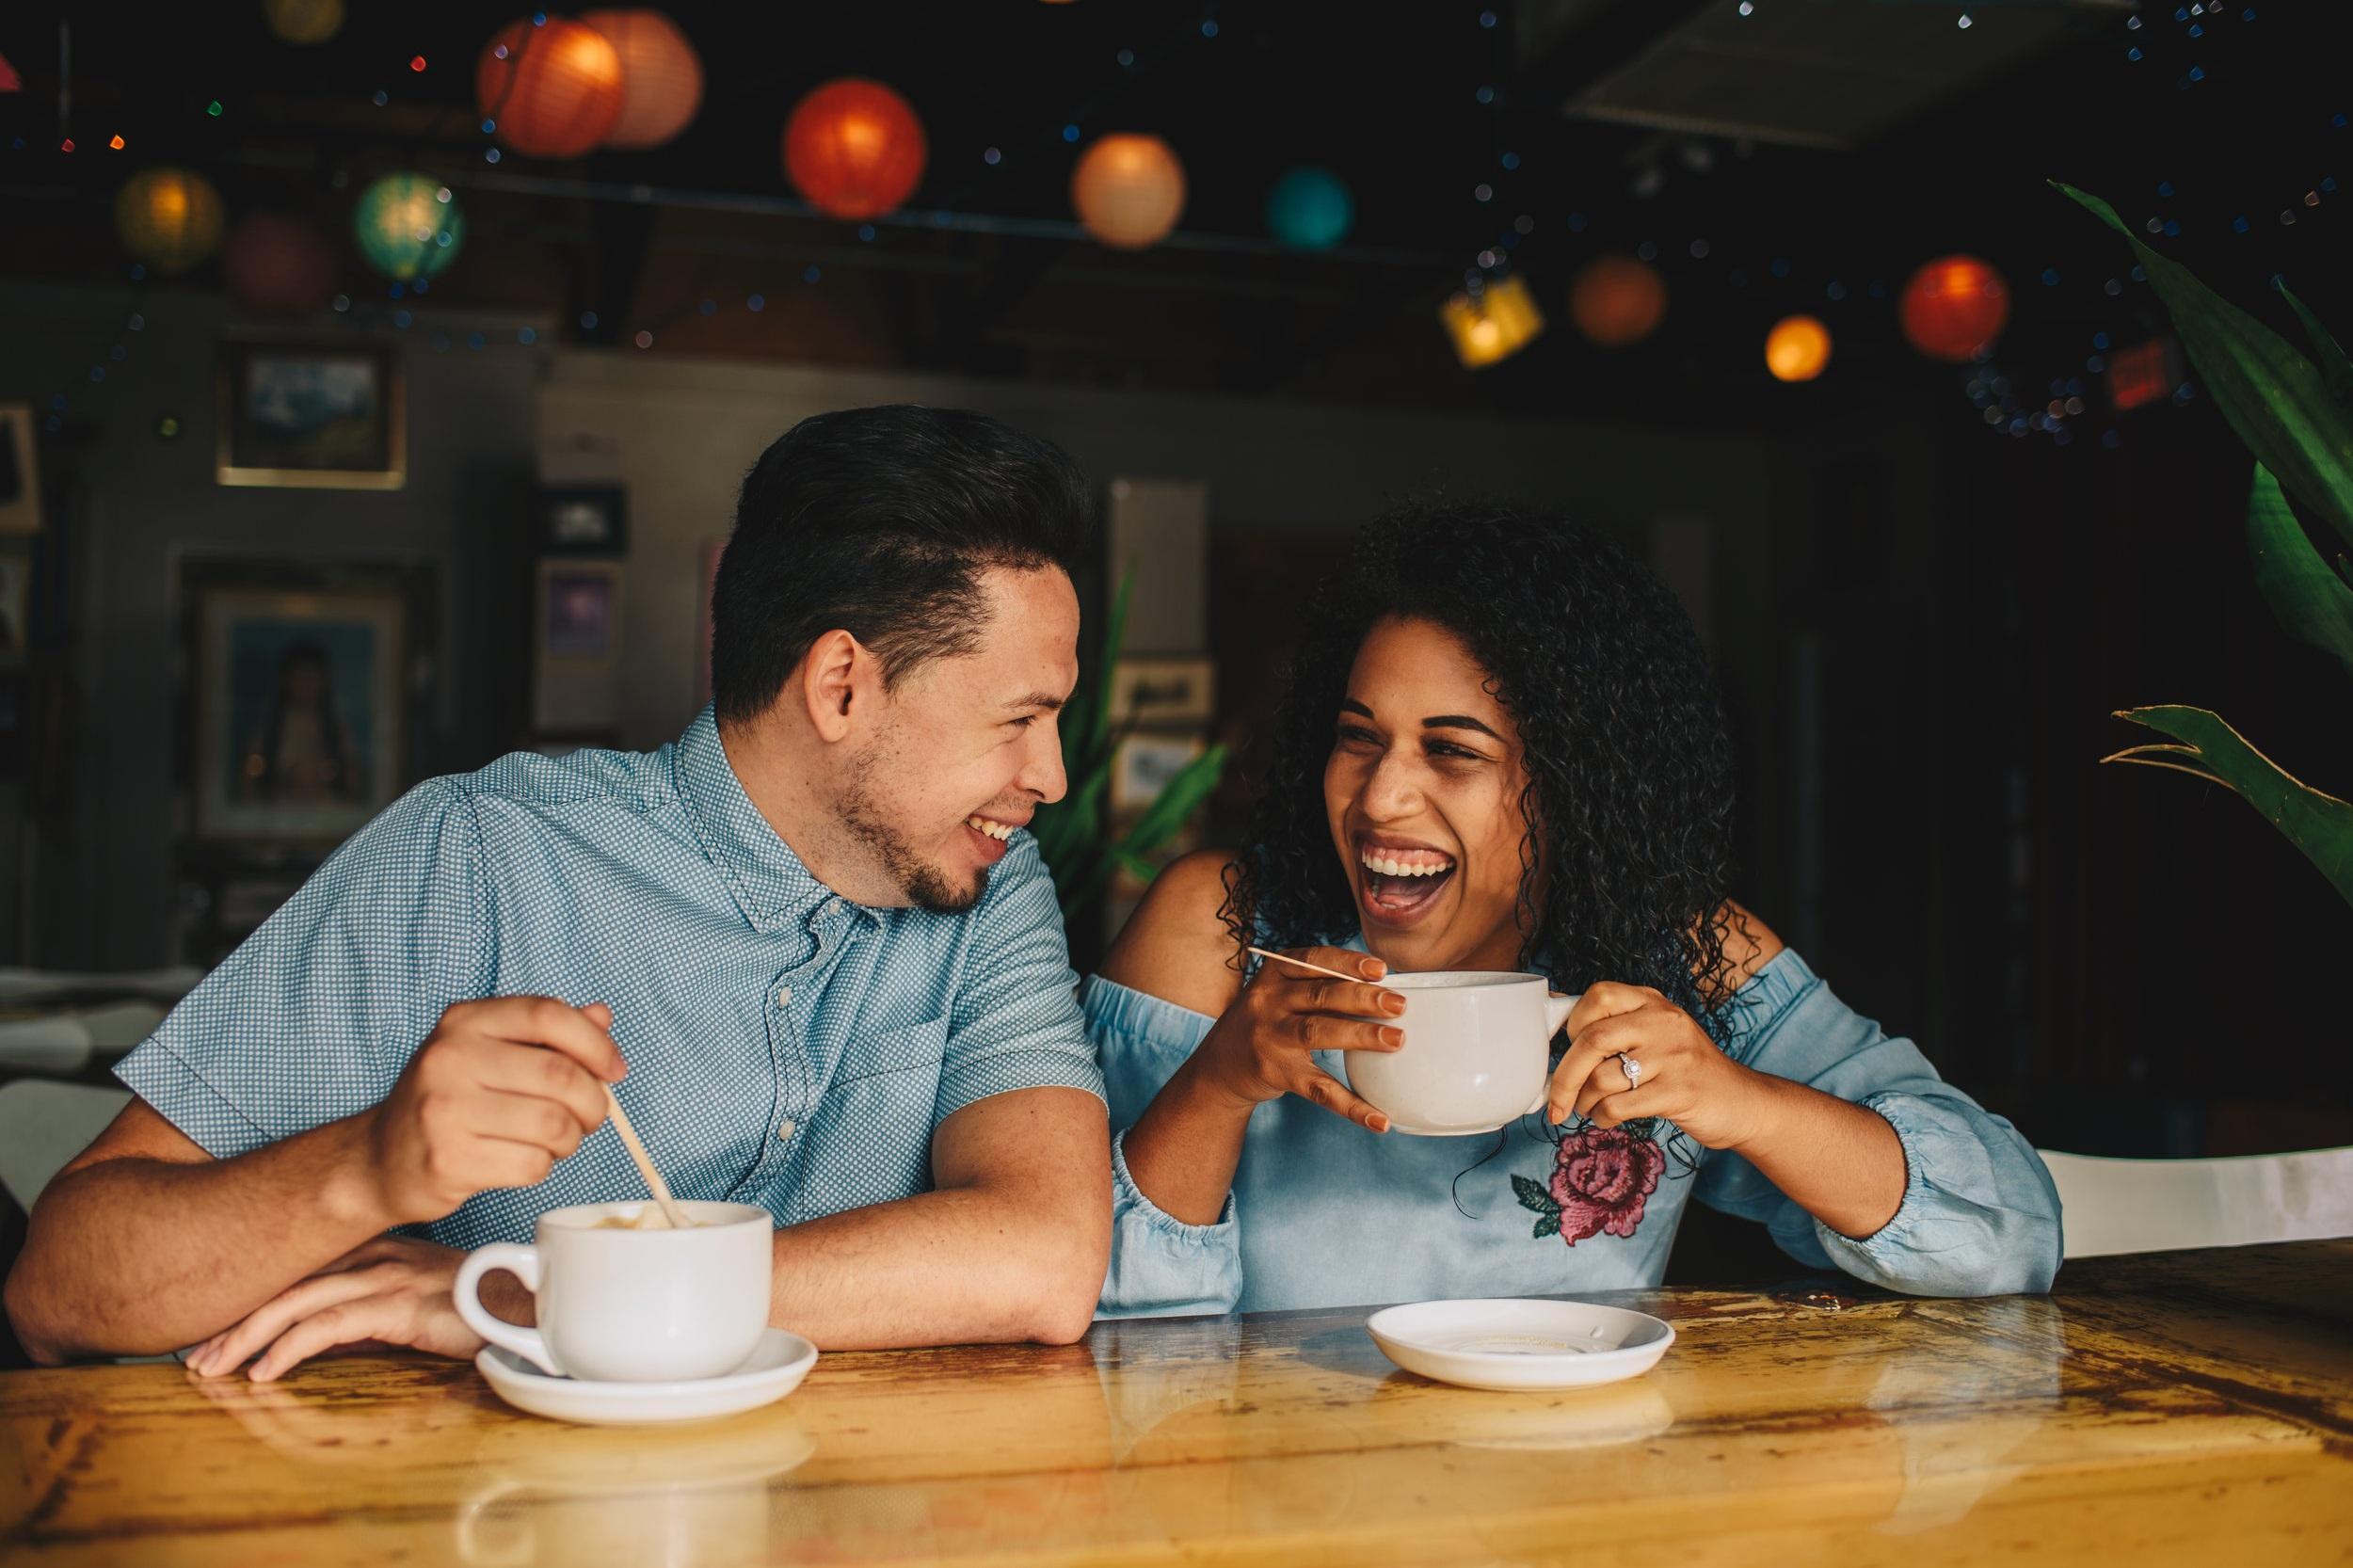 Abdy + Yvette | Coffee Shop Adventures